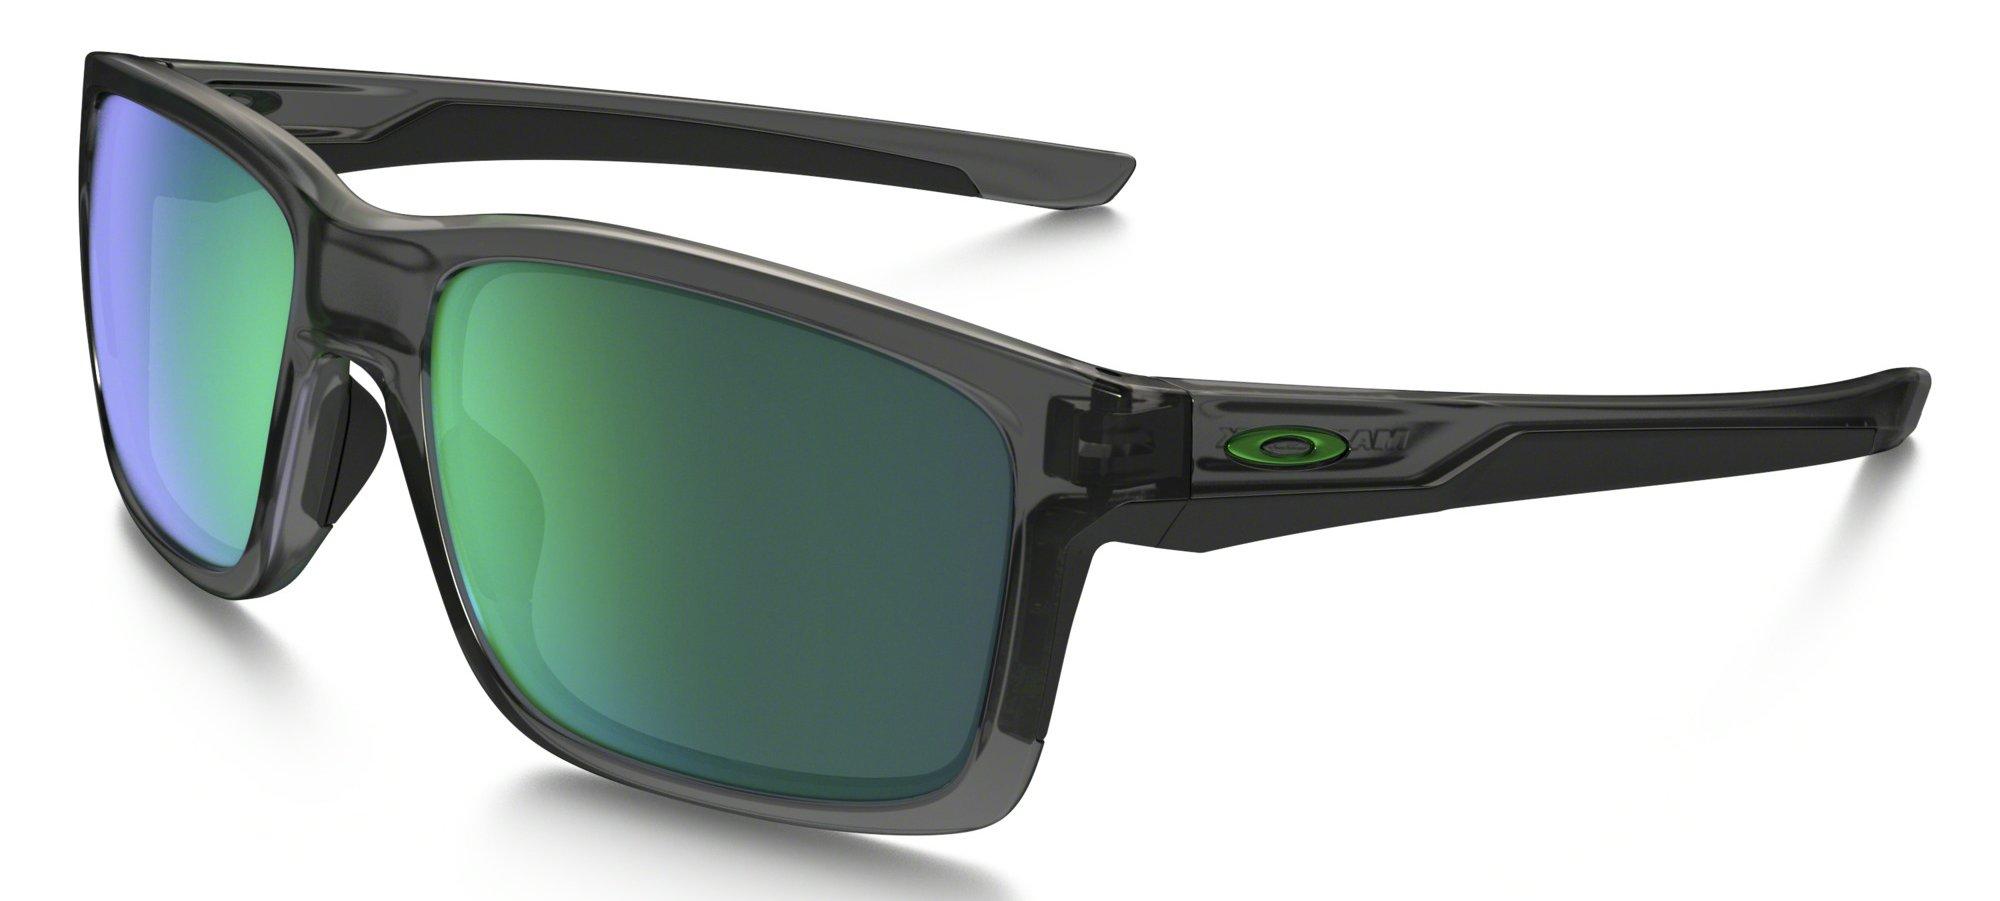 Sluneční brýle Oakley OAKLEY Mainlink Grey Smoke w/ Jade Iridium